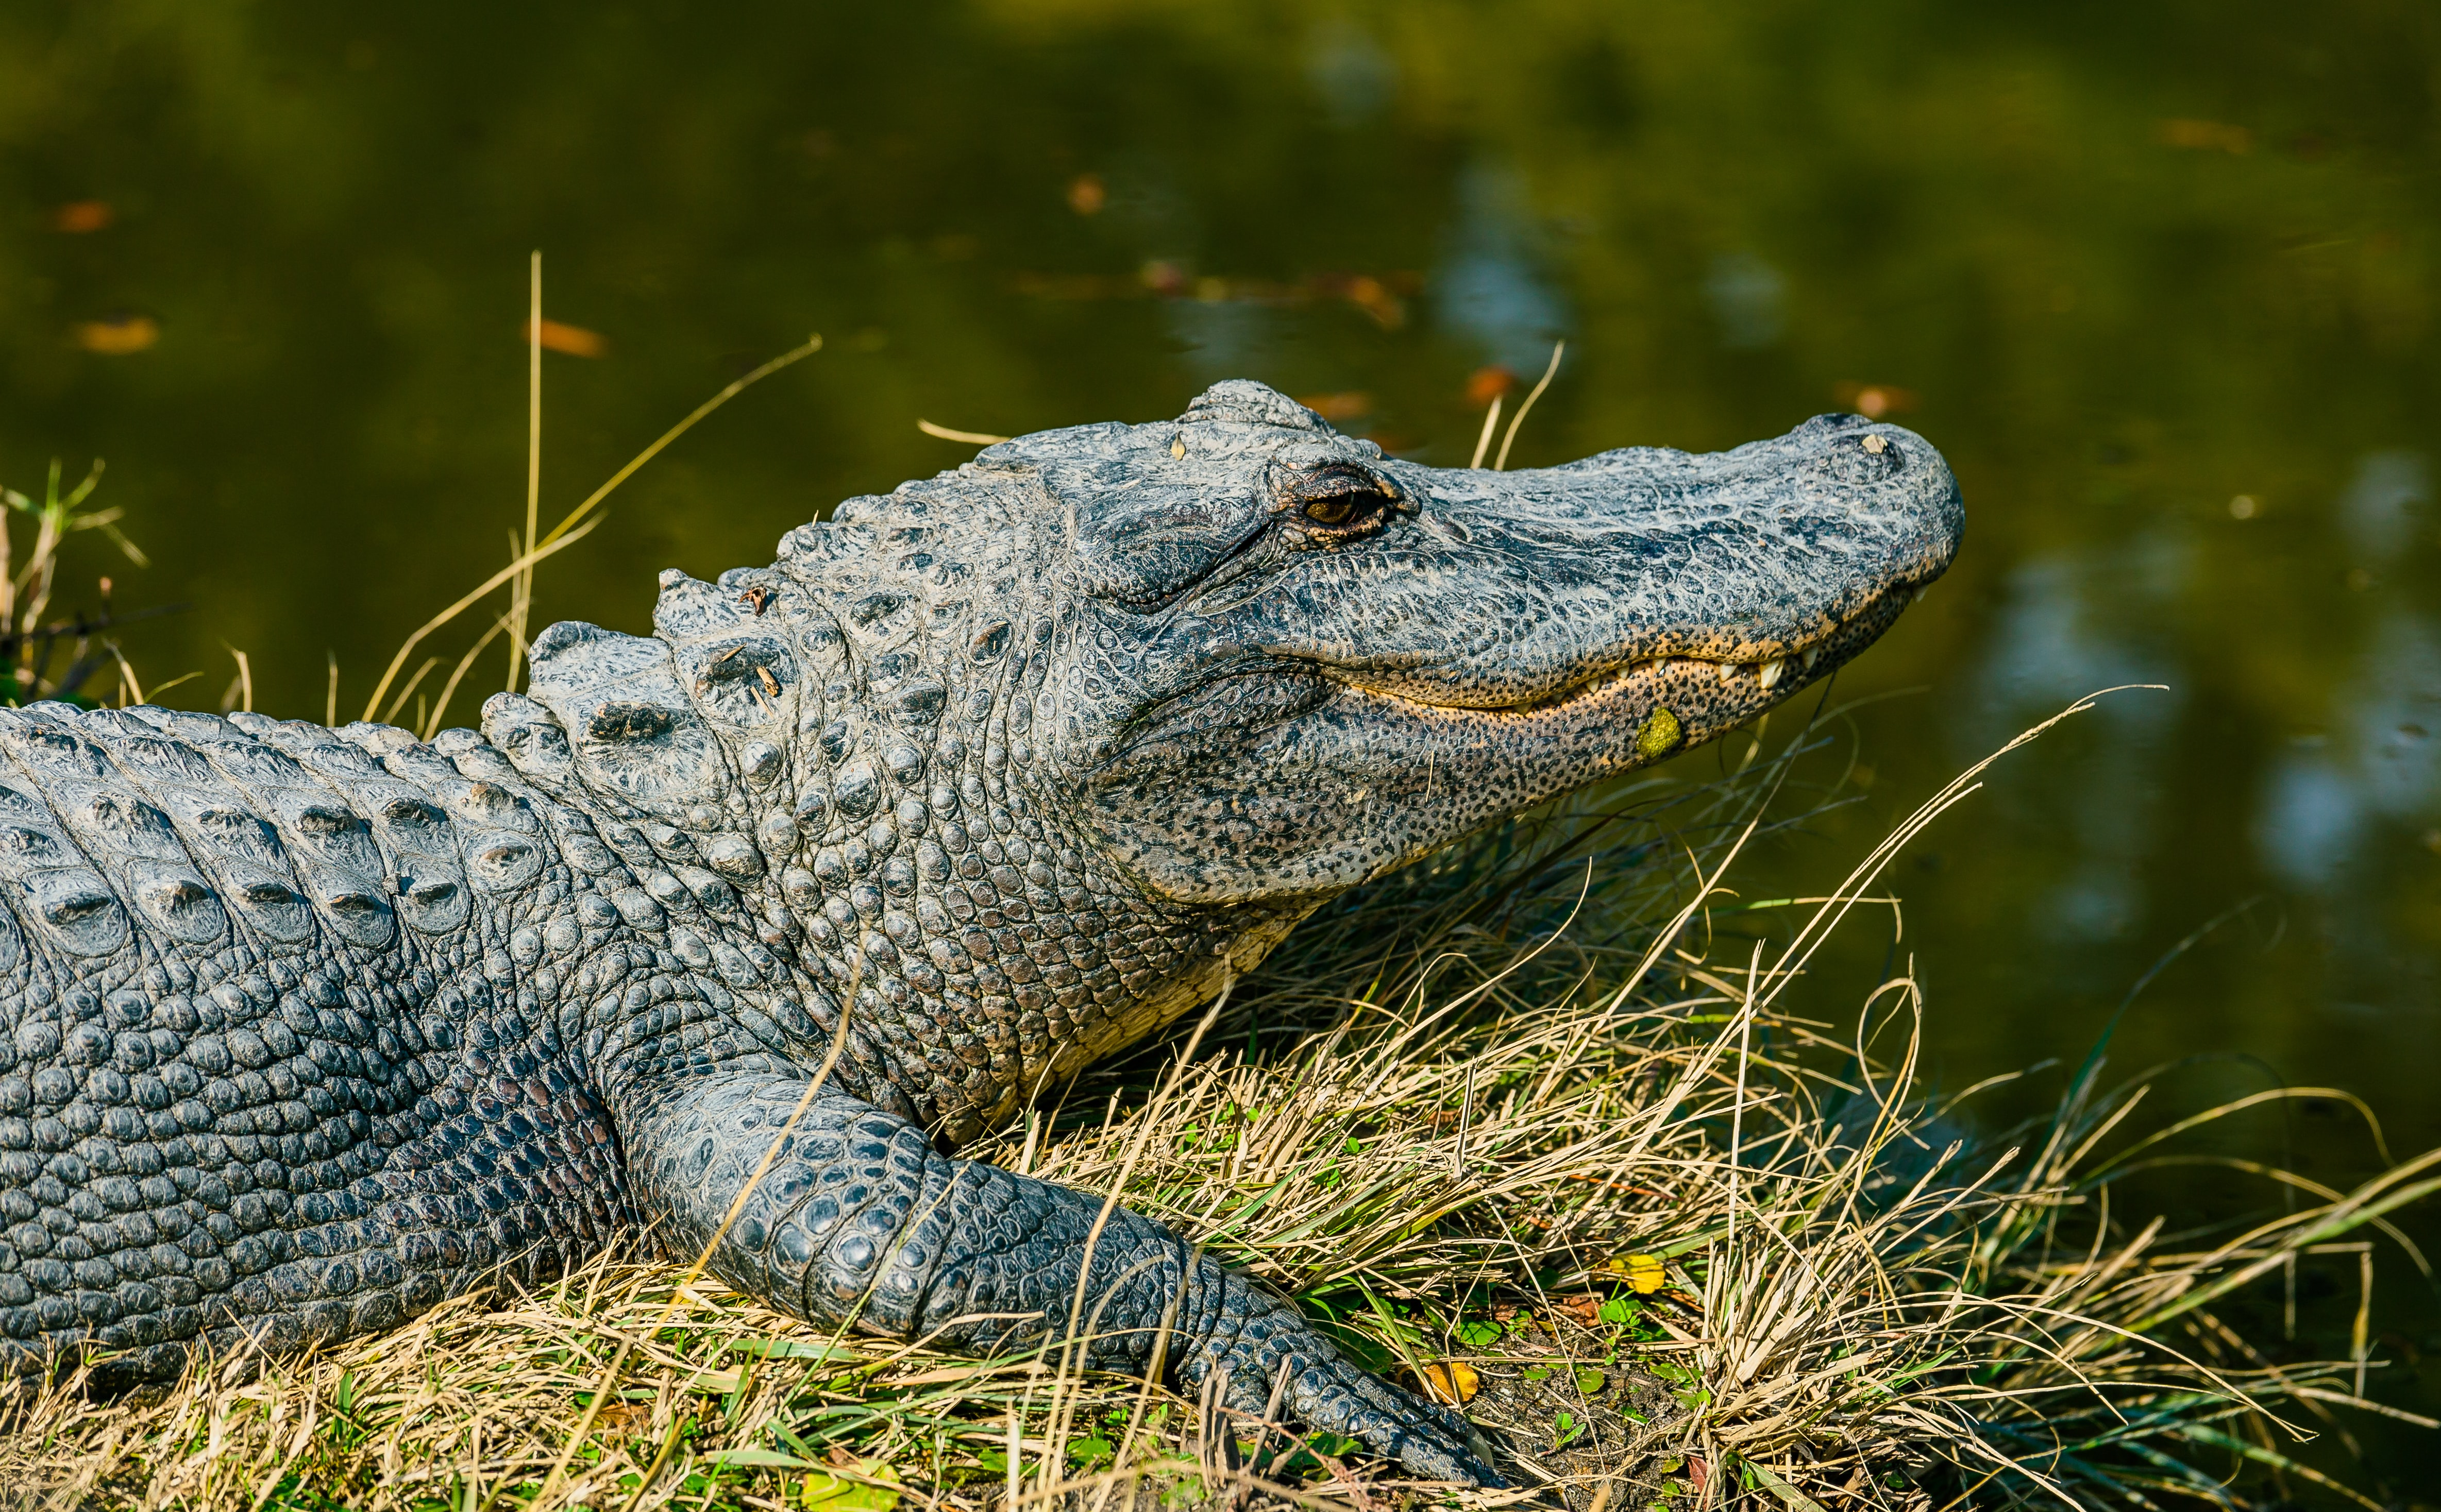 Crocodile life stories